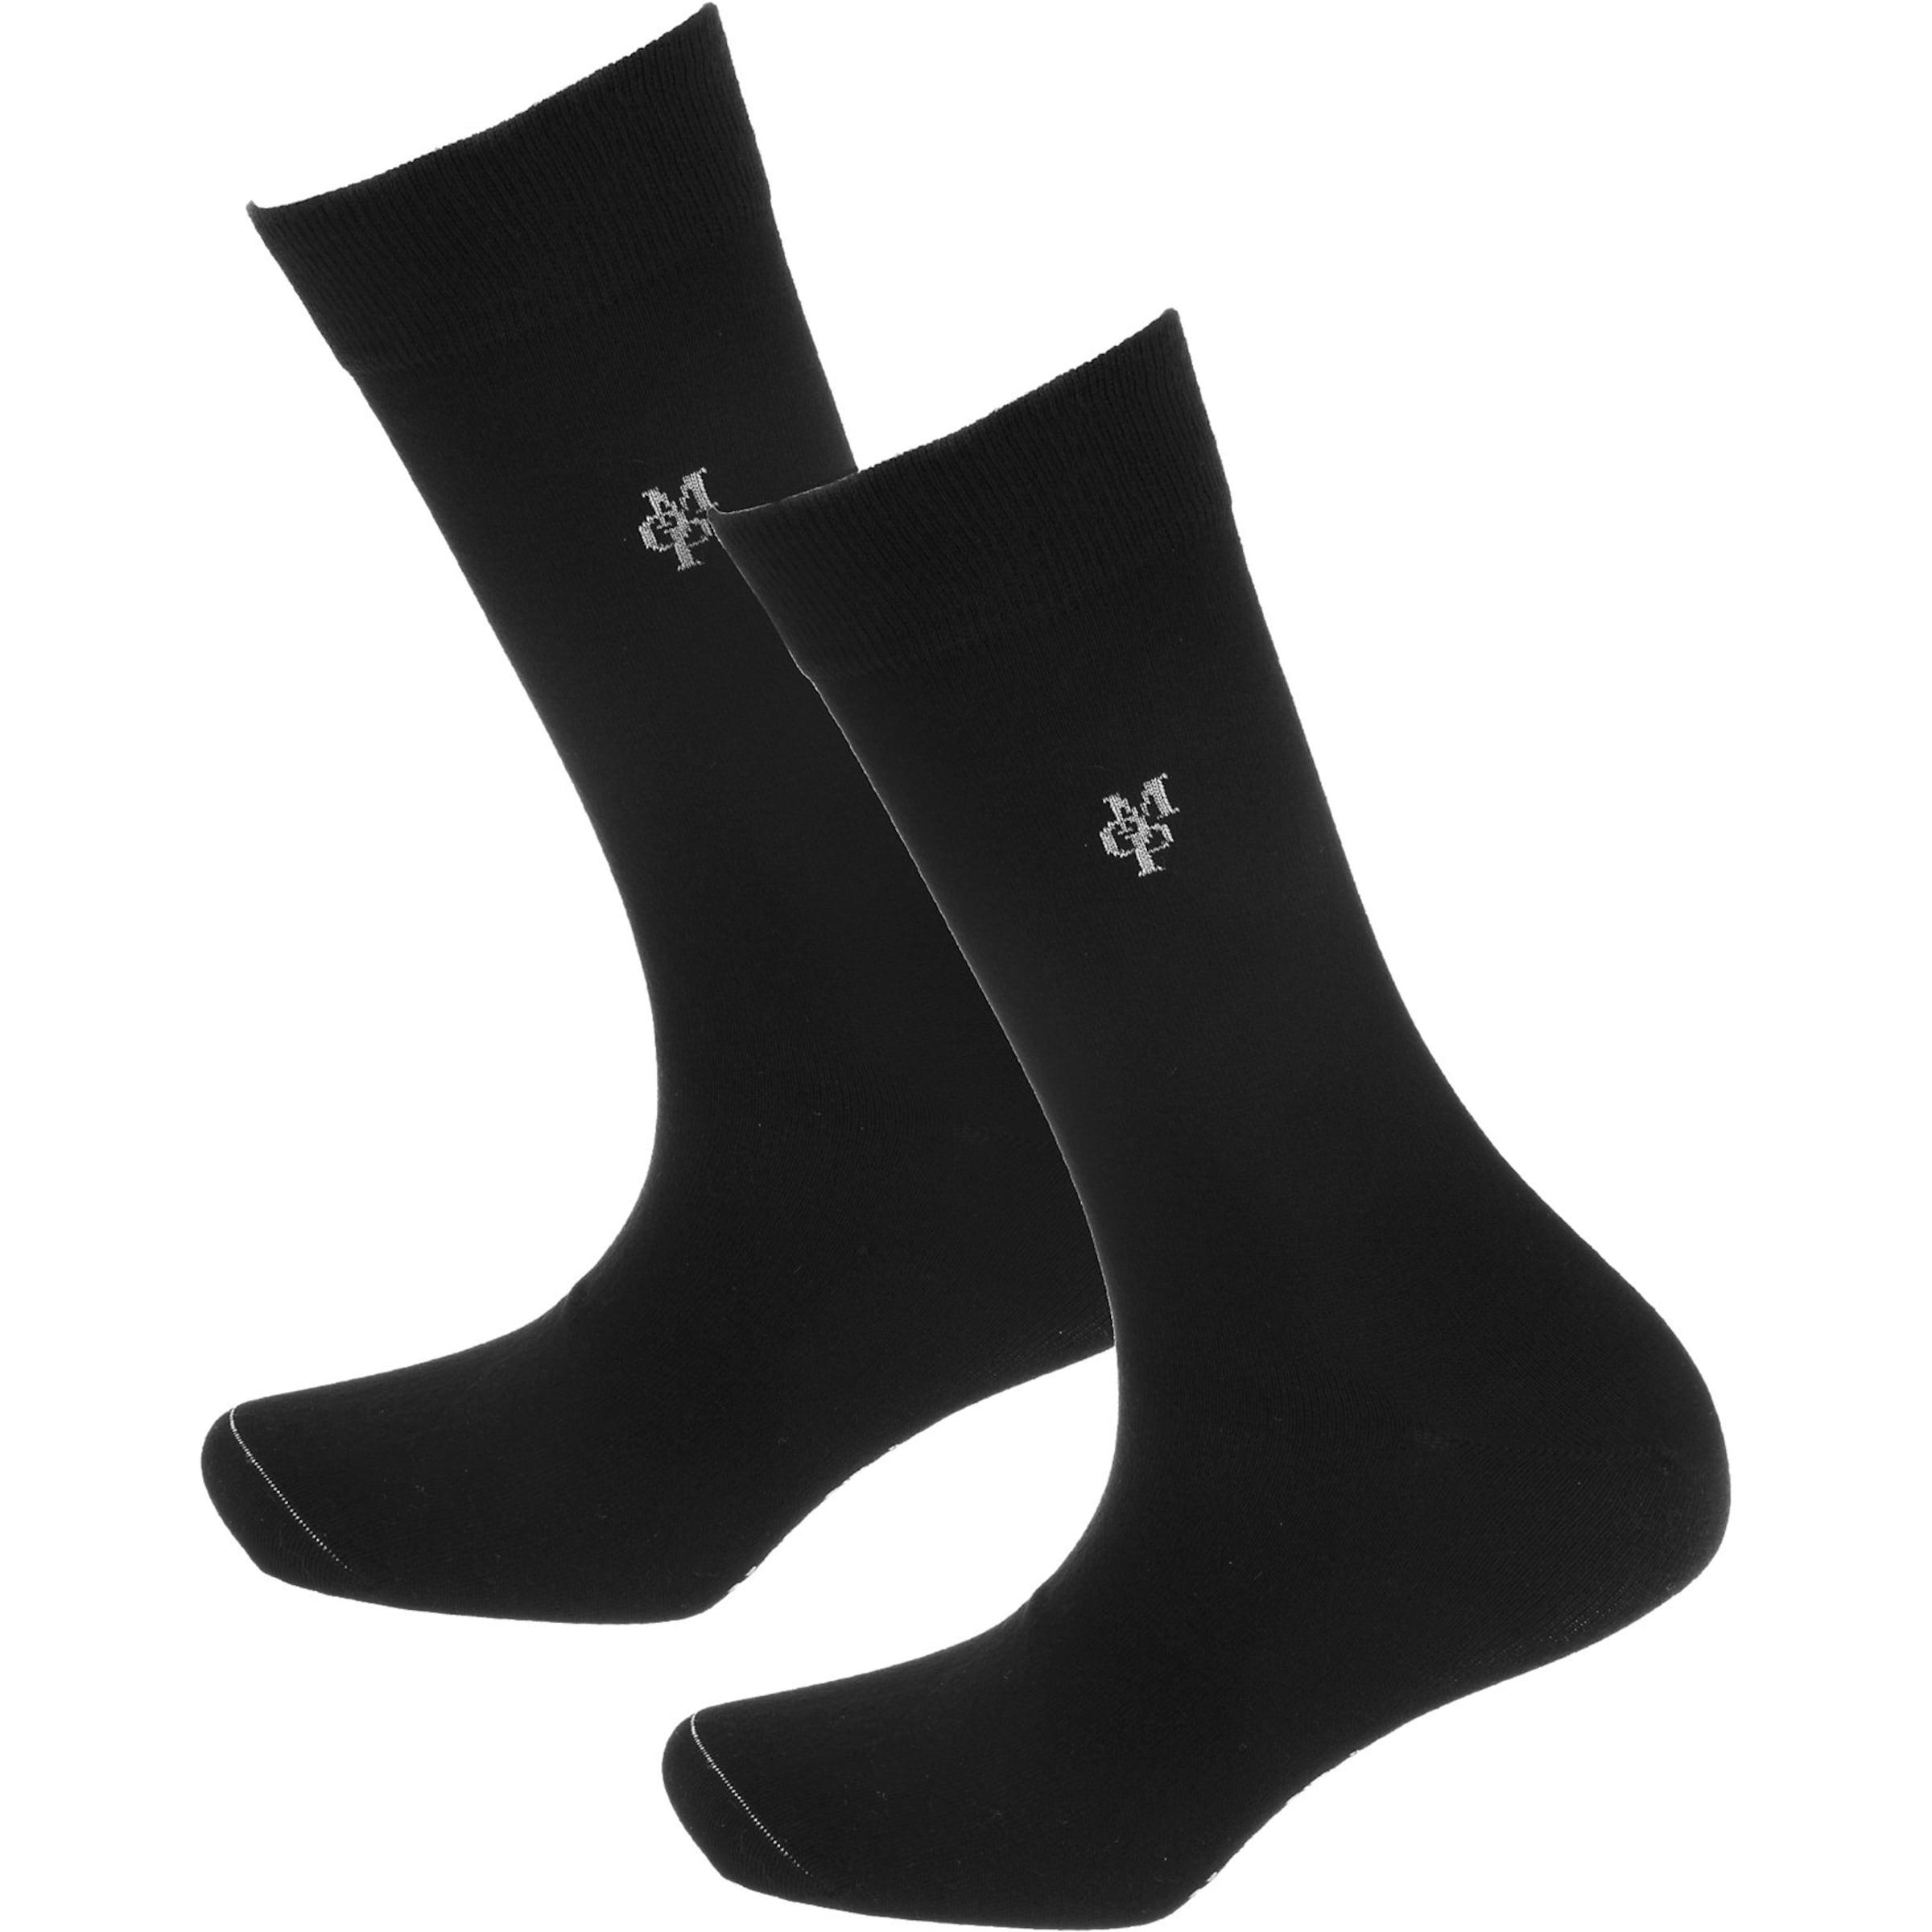 2018 Neue Preiswerte Online Spielraum Echt Marc O'Polo Ida 2 Paar Socken DTE22Wu